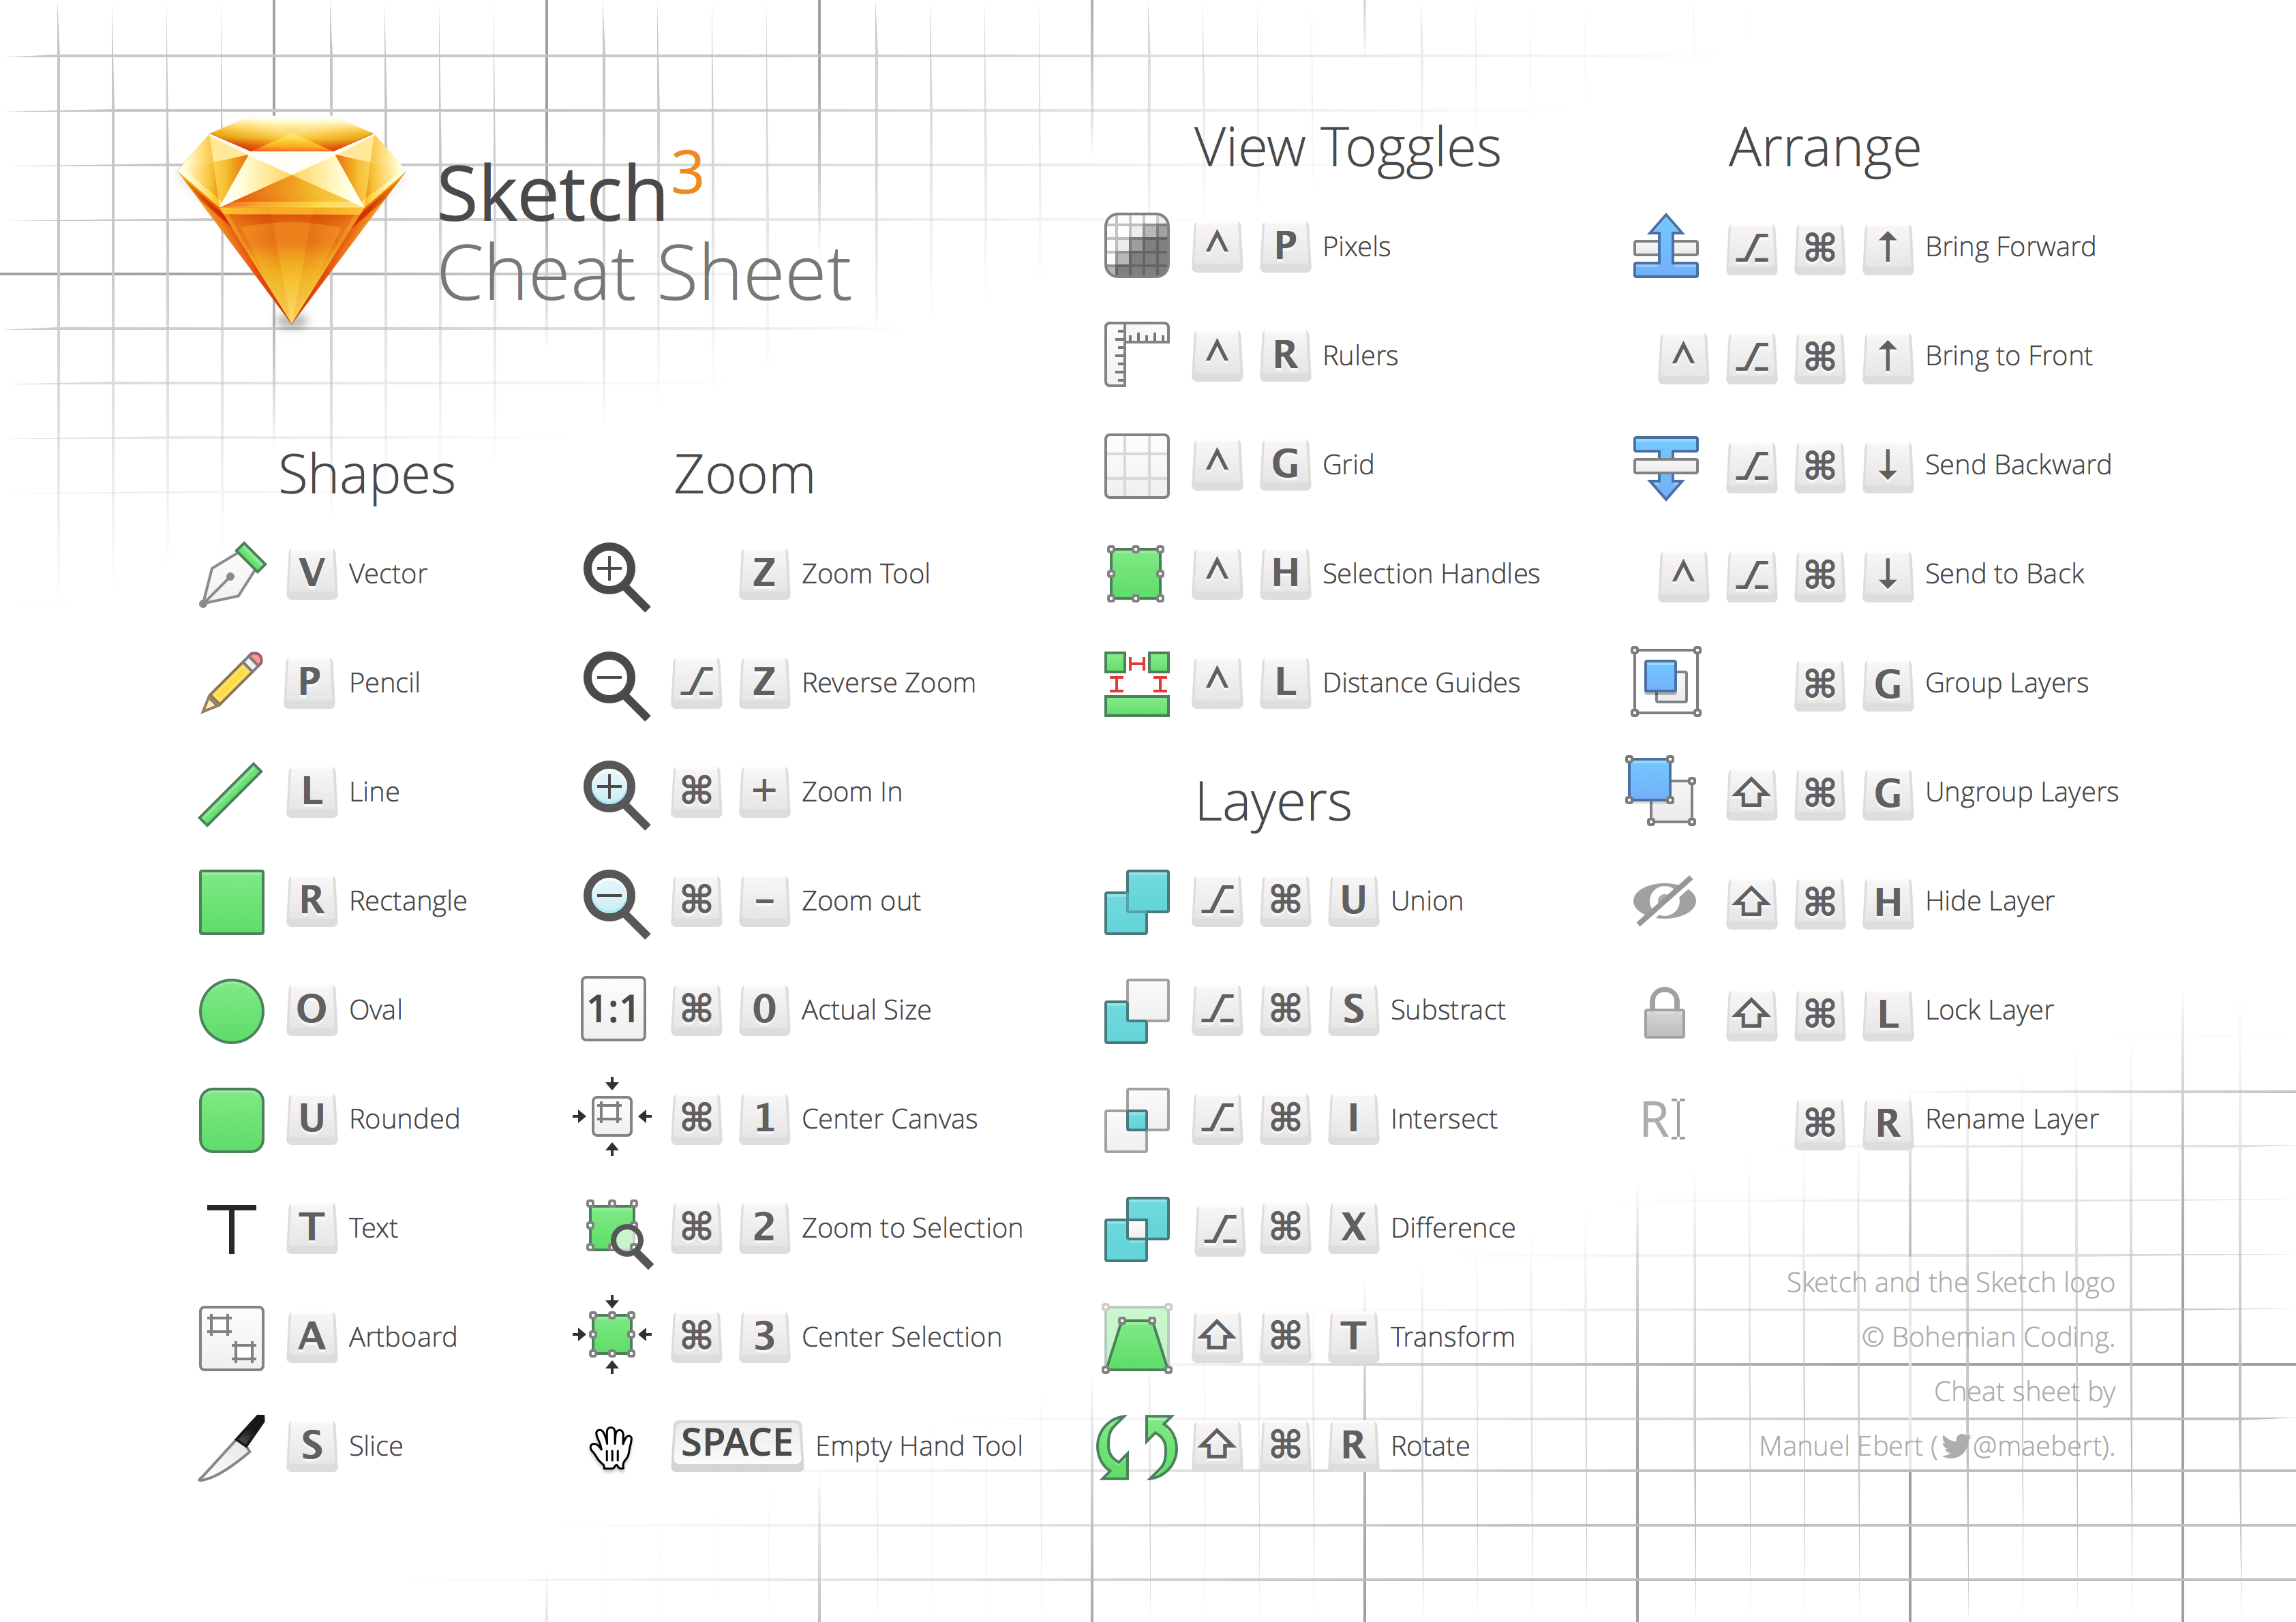 Sketch Cheat Sheet